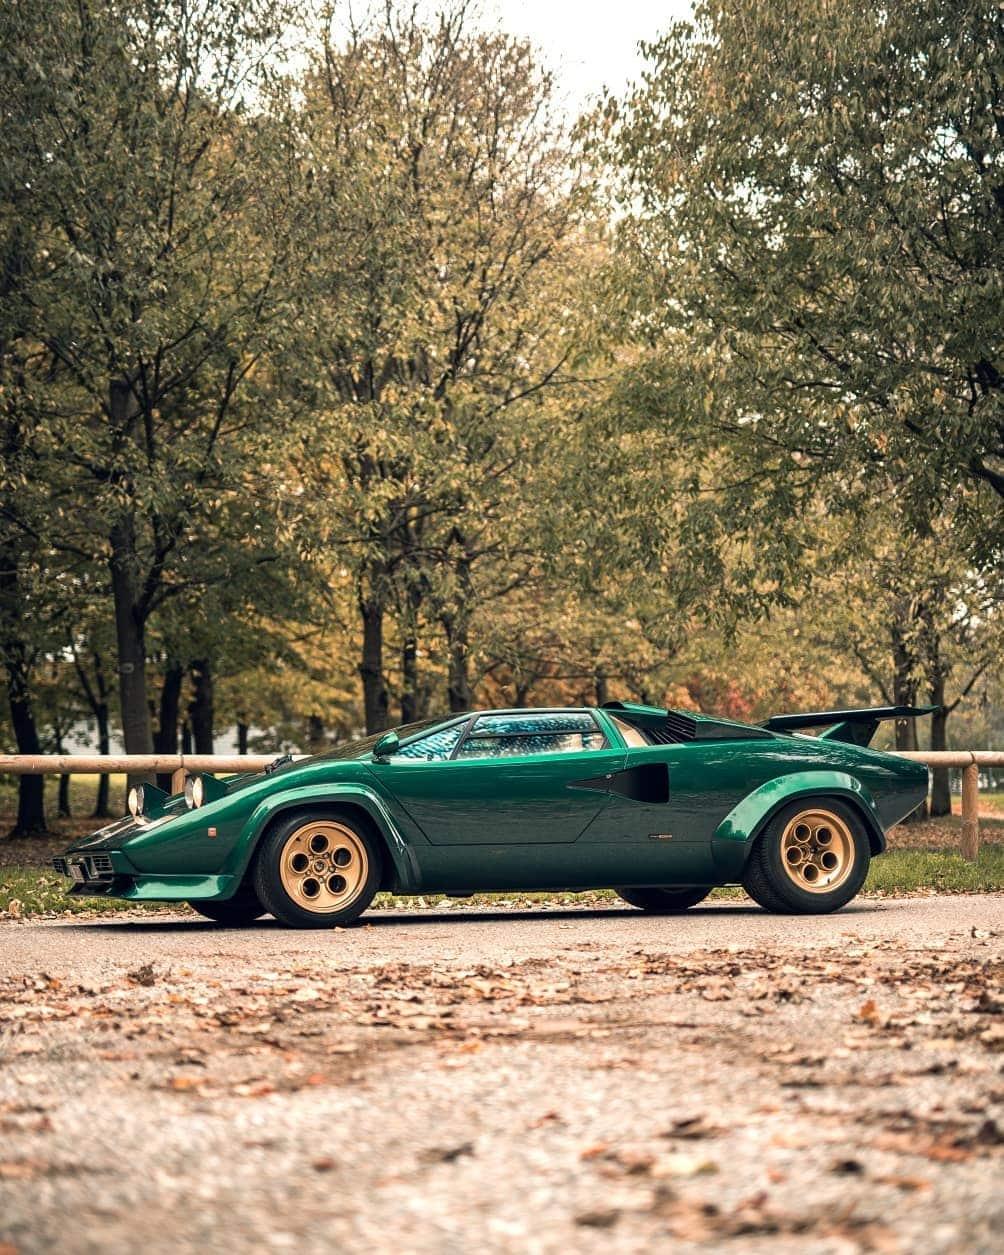 Lamborghini Countach @davidclementephotography - Image 4